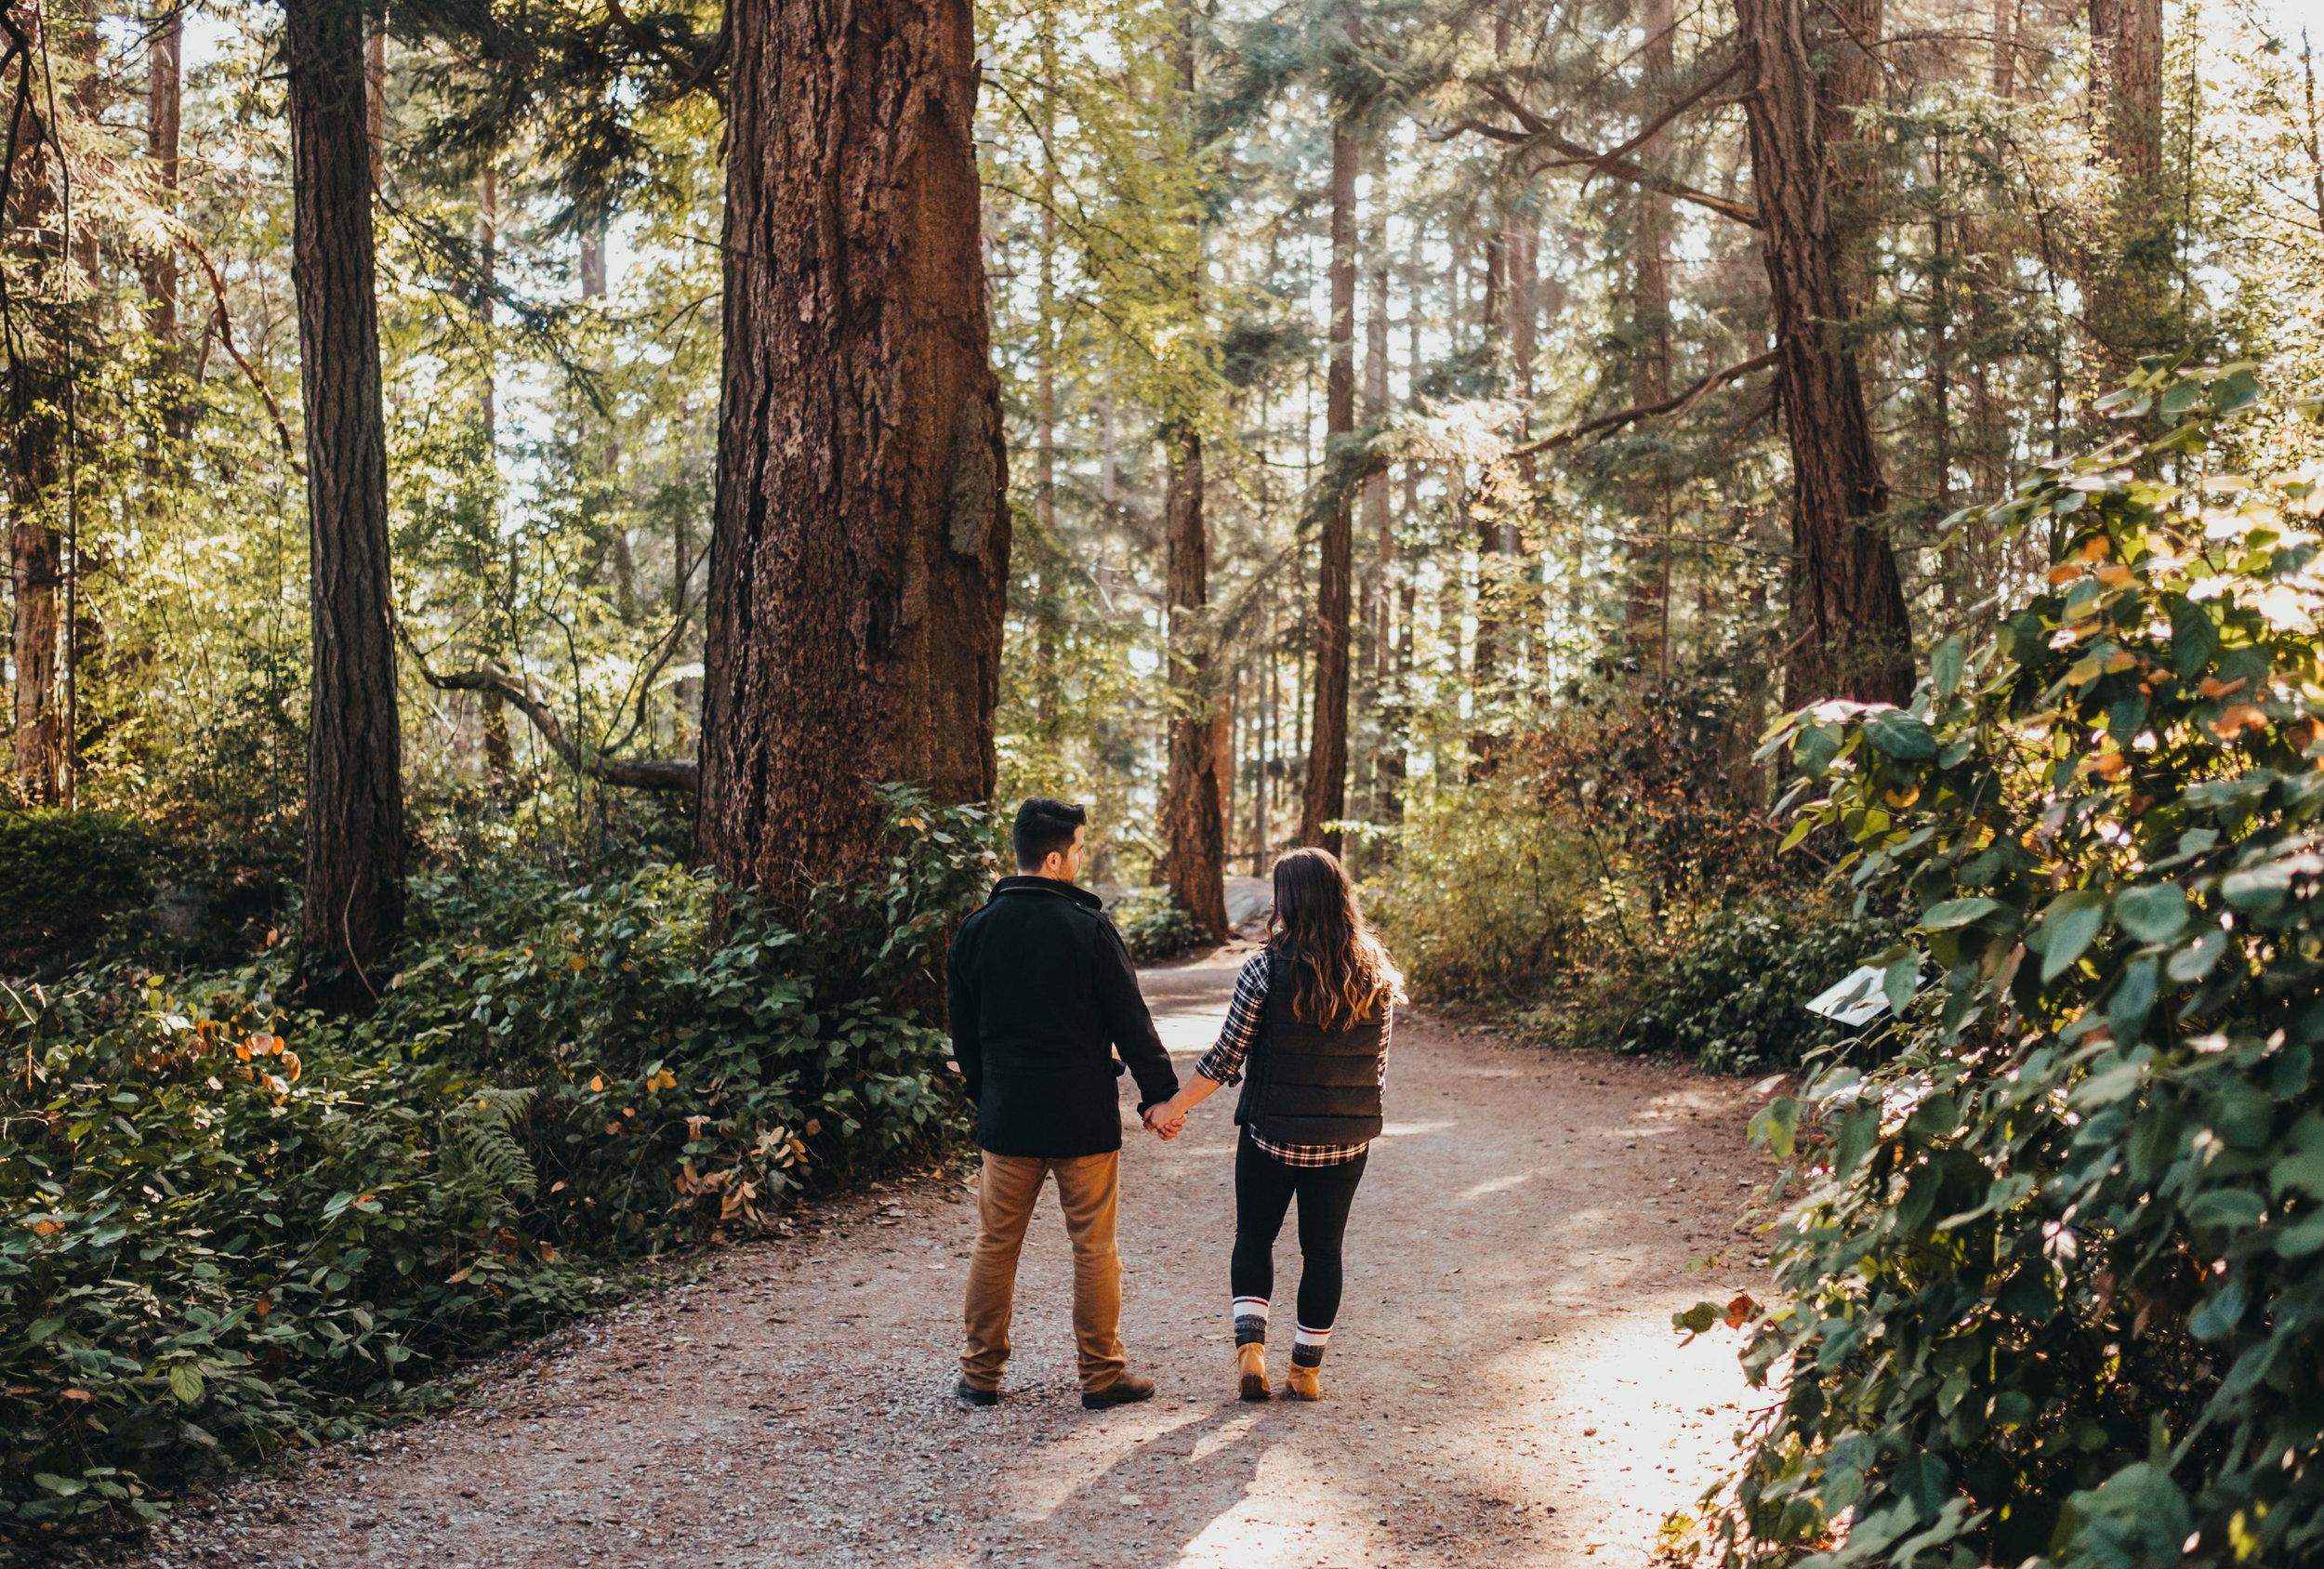 Lighthouse Park Engagement Photos - Vancouver Wedding Photographer & Videographer - Sunshine Coast Wedding Photos - Sunshine Coast Wedding Photographer - Jennifer Picard Photography - DSCF2308.jpg